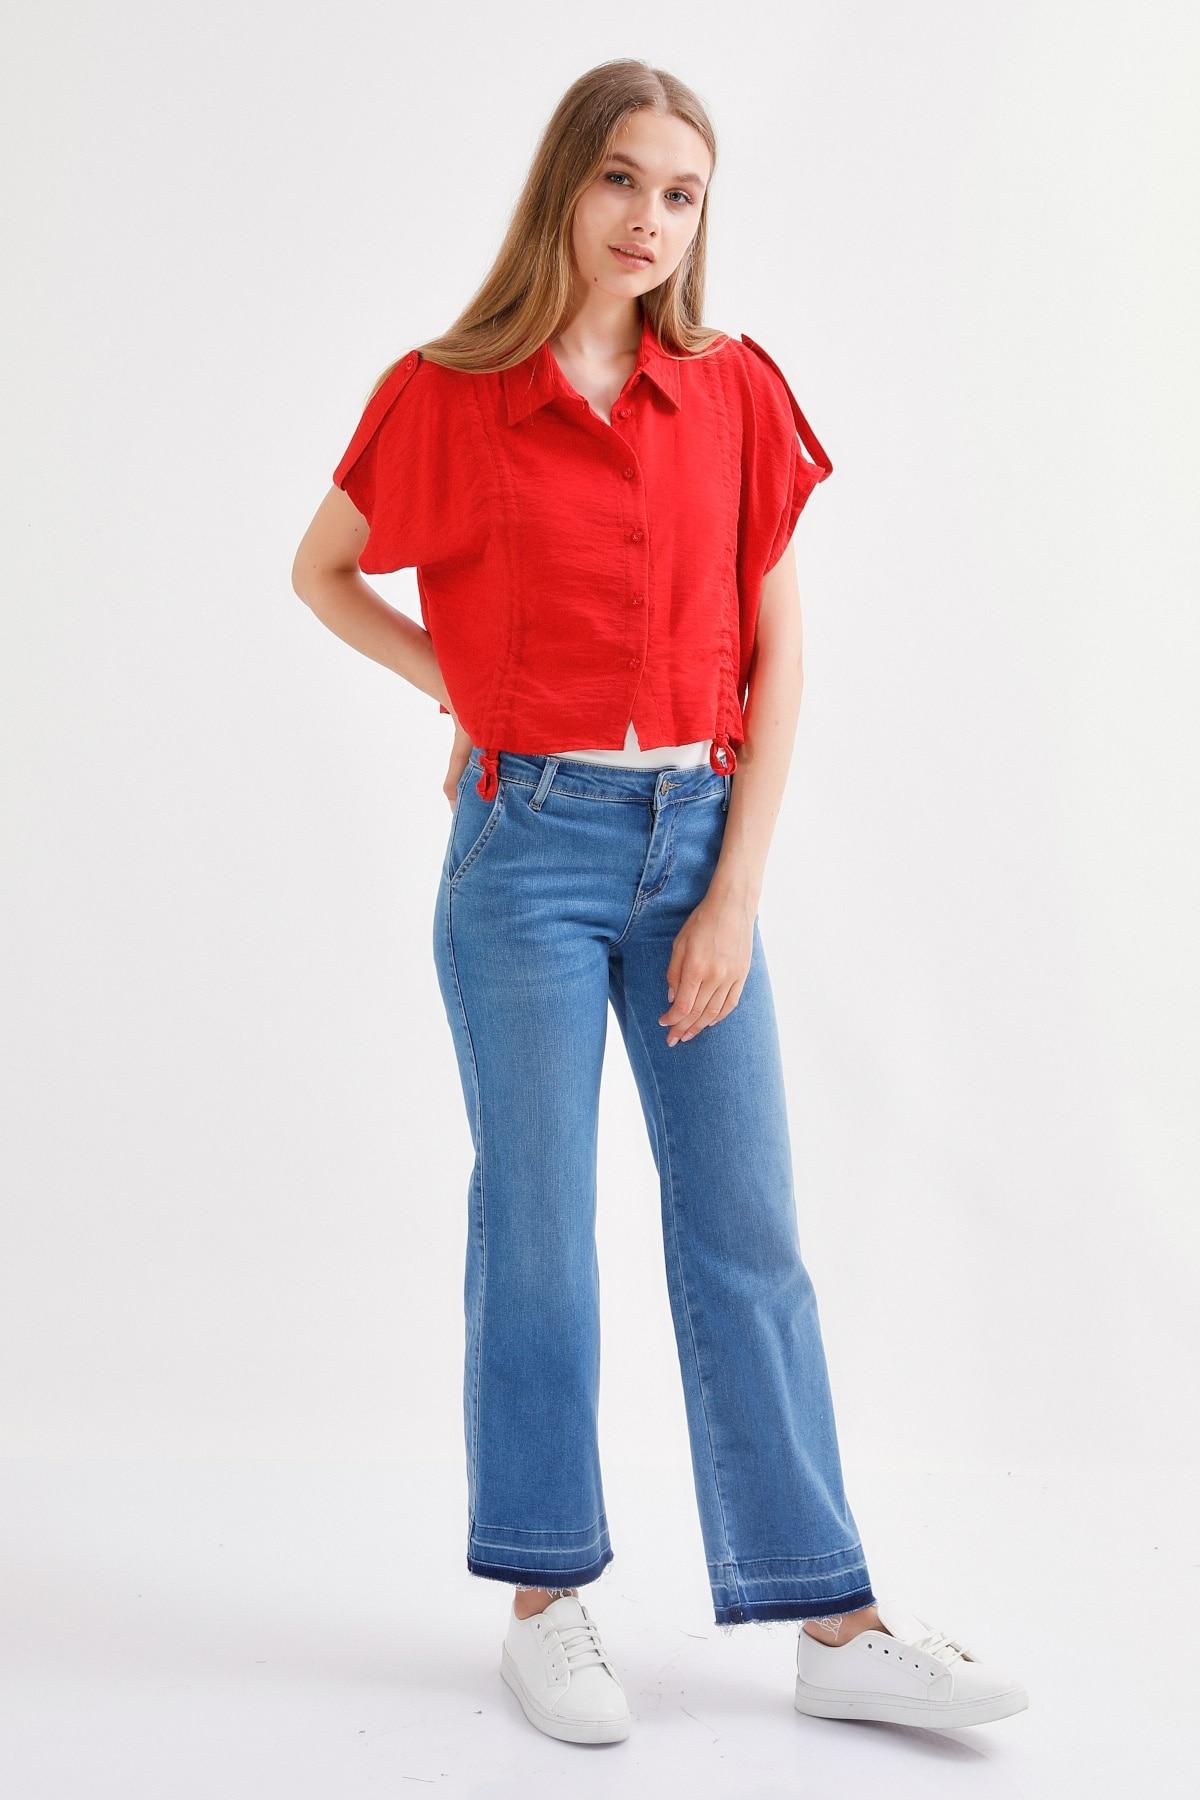 Flare ultra lycra jean calças premium-azul escuro